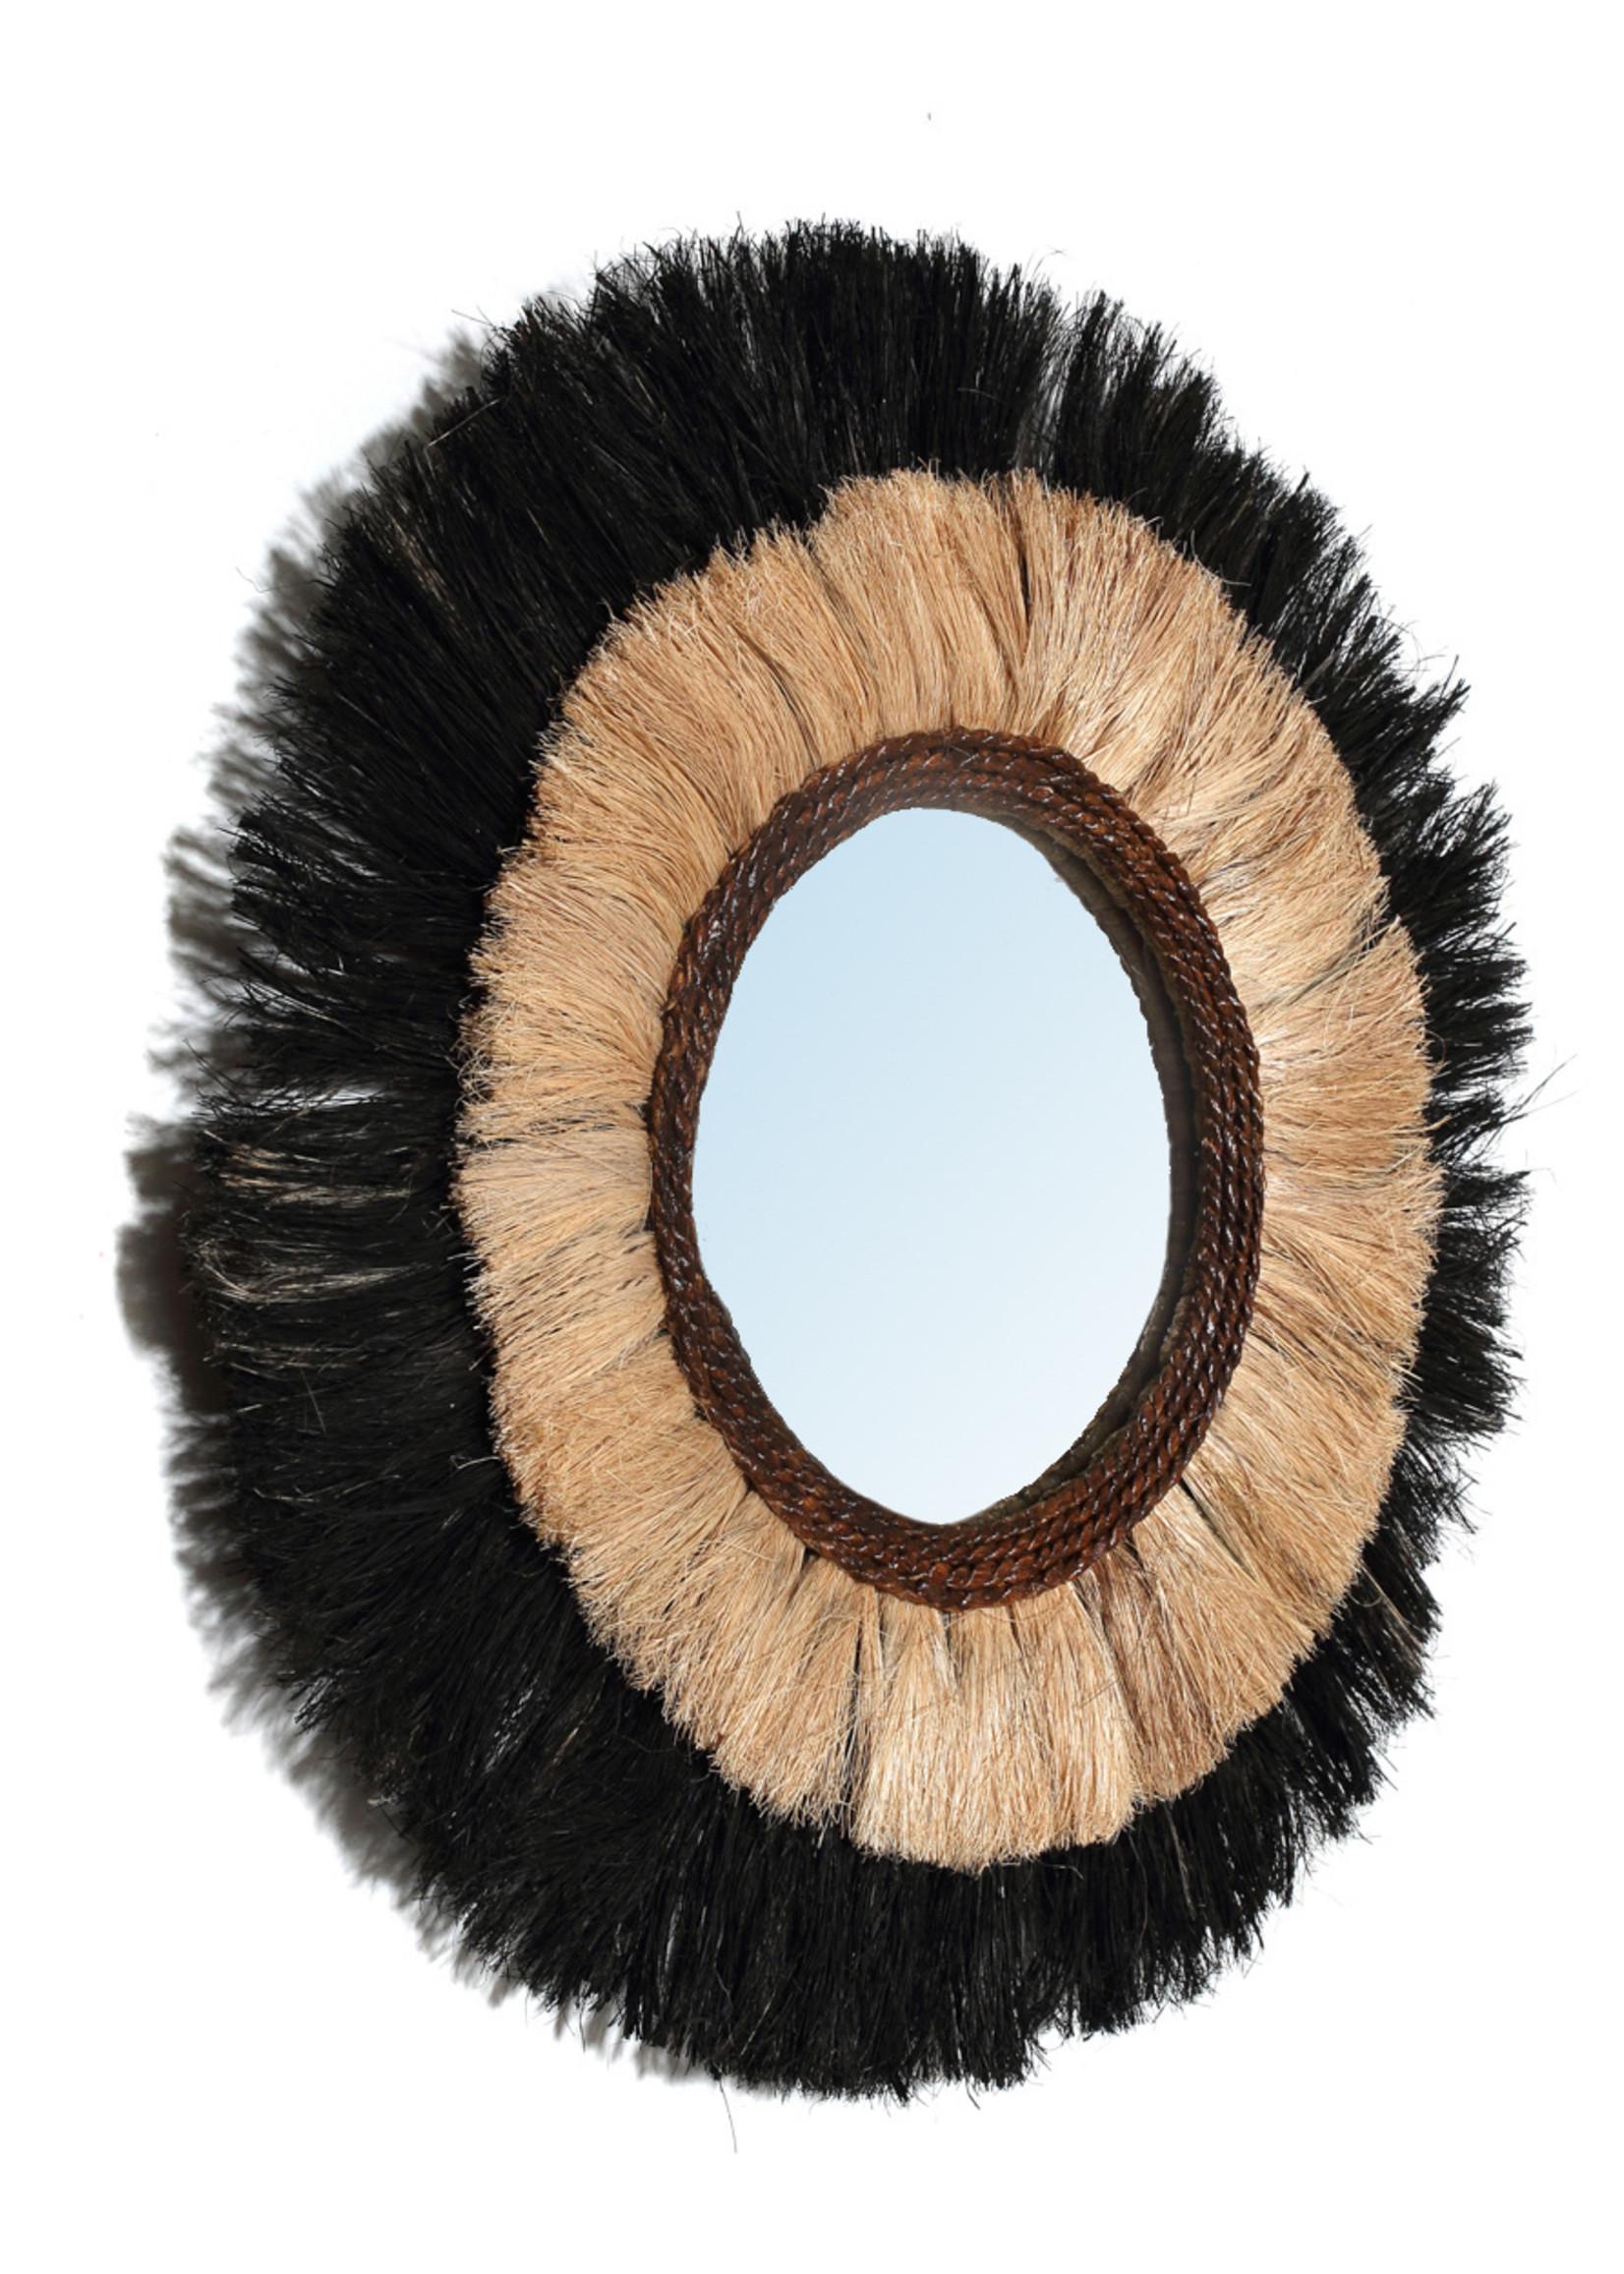 The Blackout Mirror - Natural Black - M